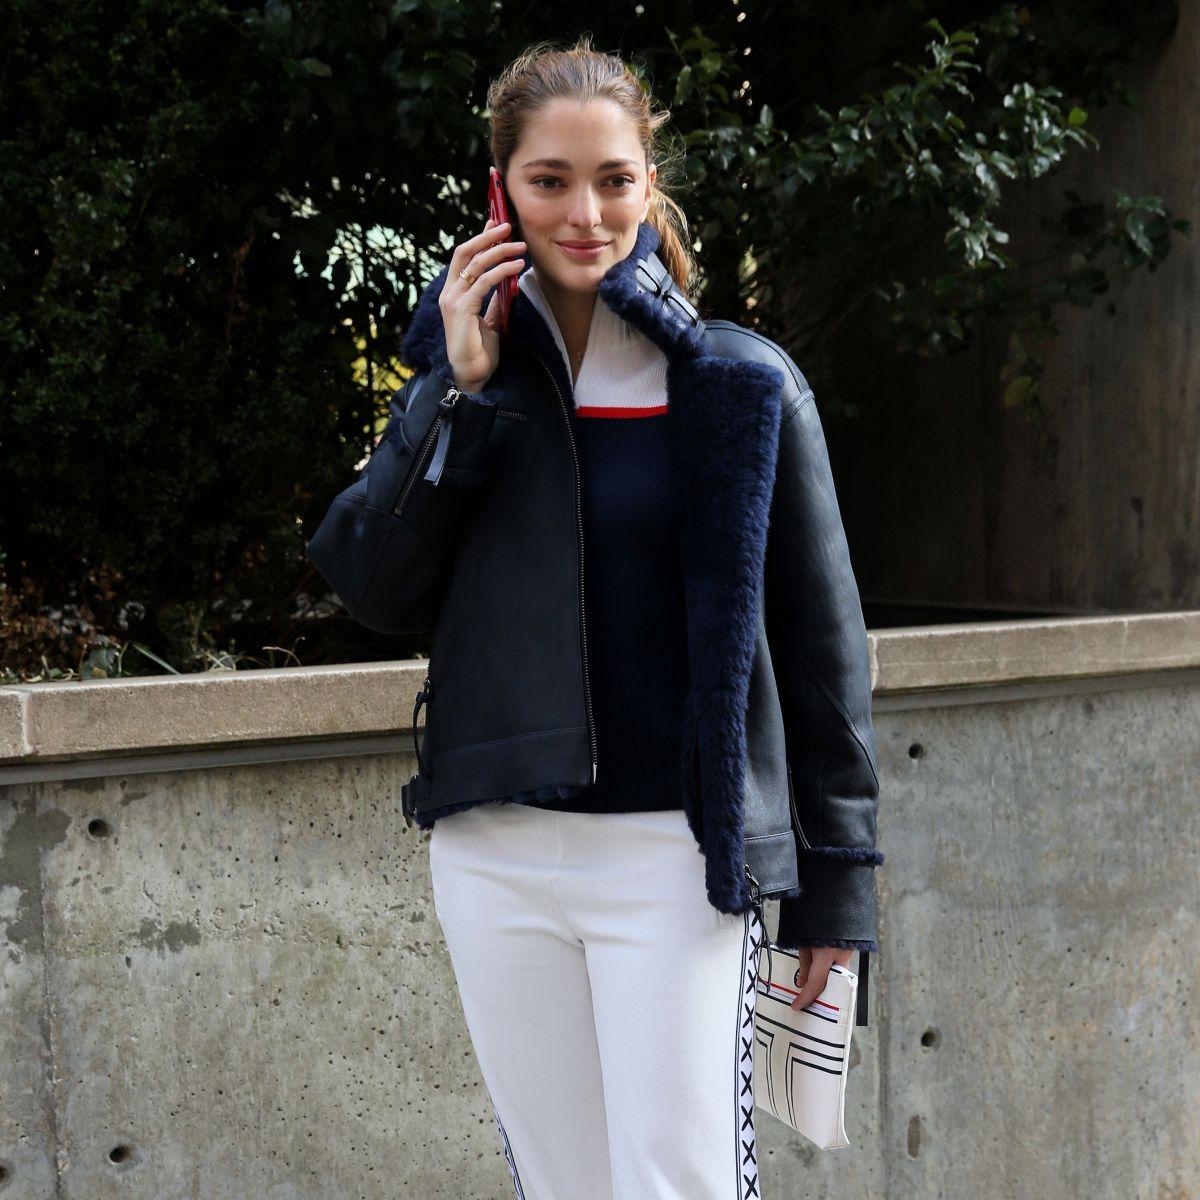 c1ffe6559 SOFIA SANCHEZ DE BETAK Arrives at Tory Burch Fall Winter 2018 19 Fashion  Show at New York Fashion Week 02 09 2018